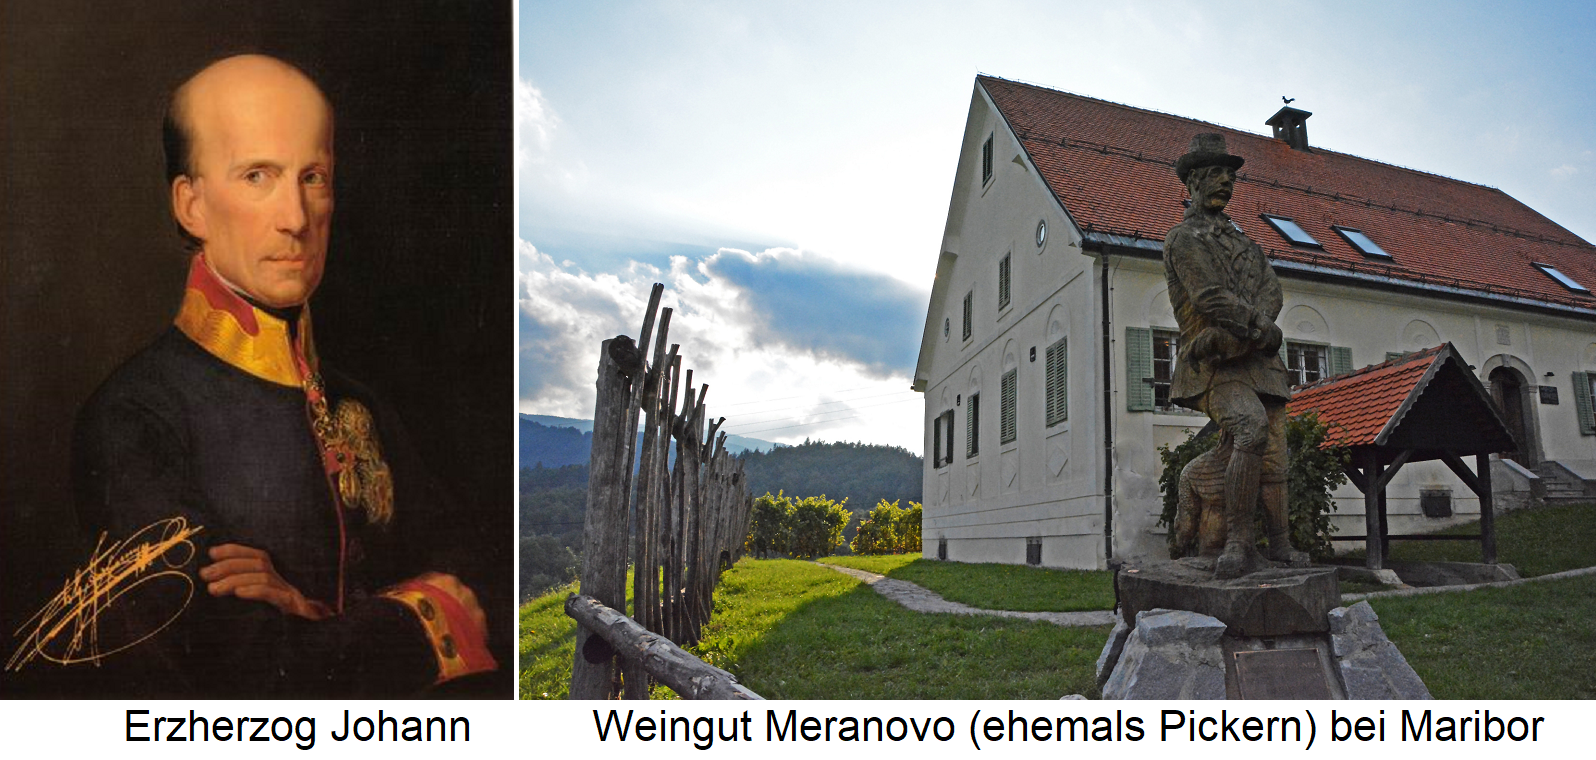 Erherzog Johann - Port and winery Meranovo (Pickern) at Maribor